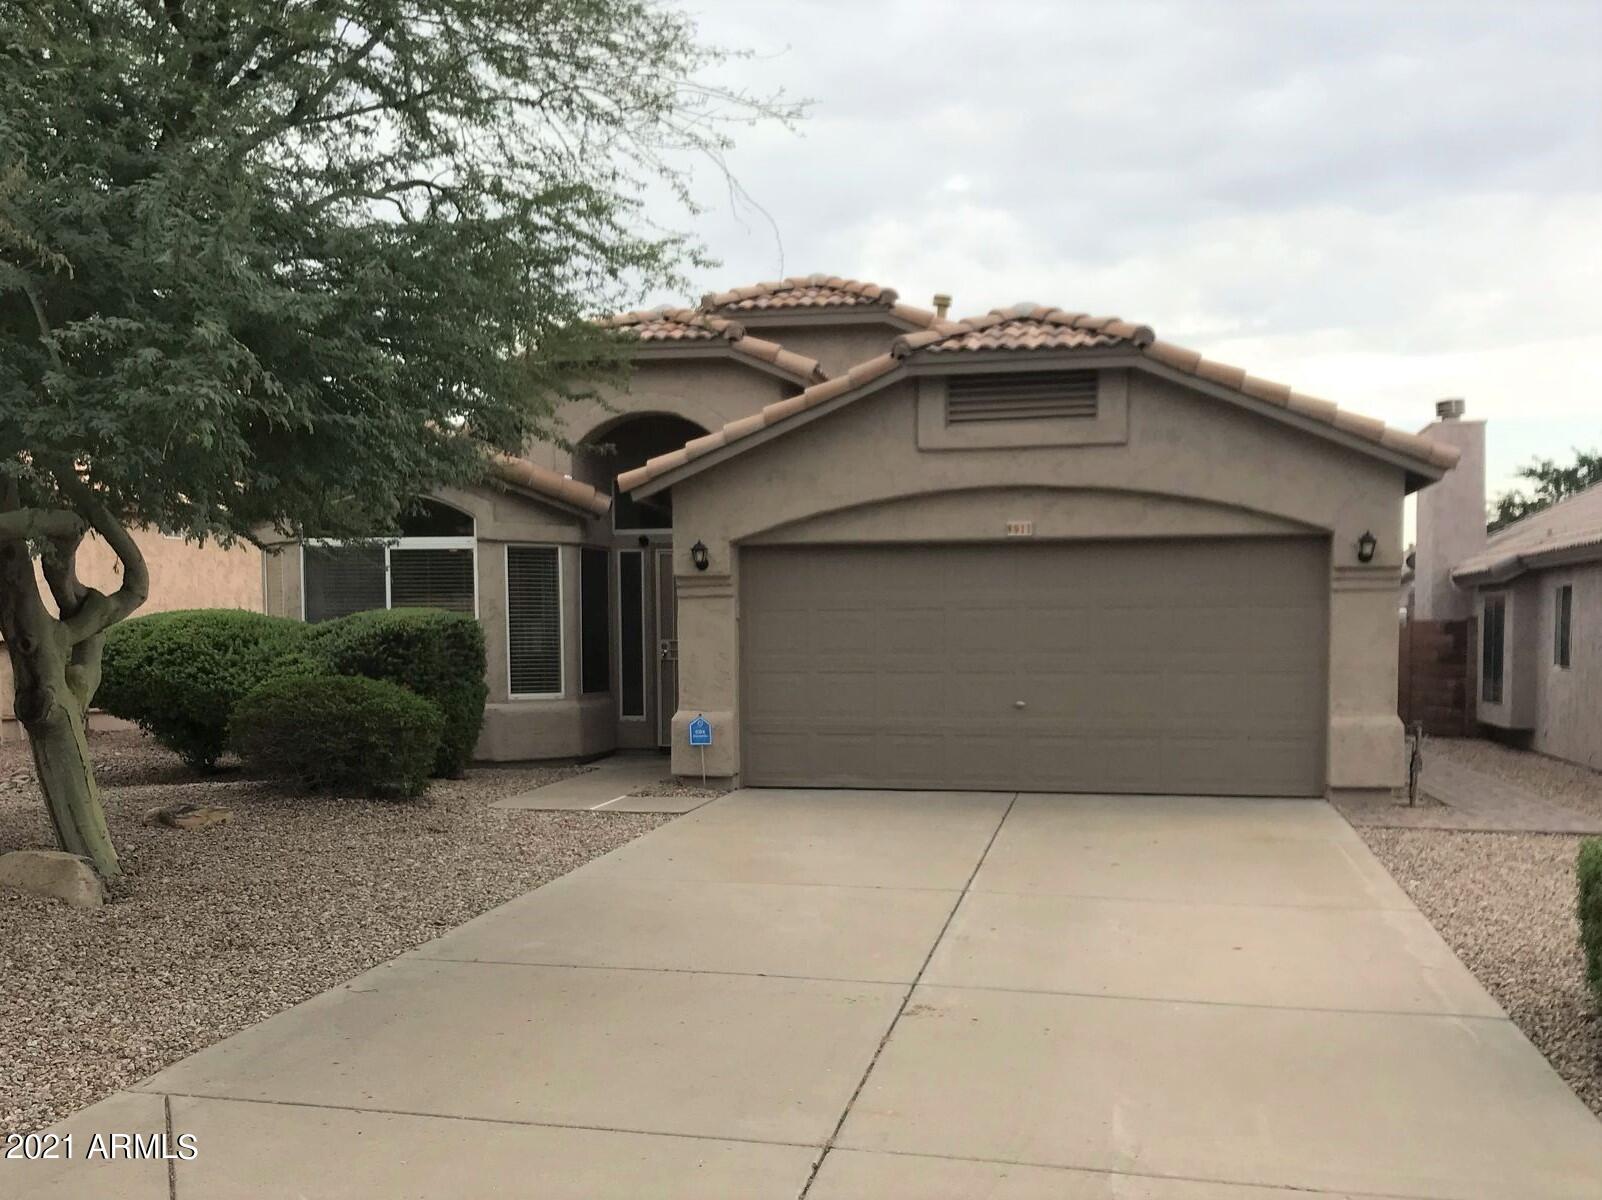 911 E MOHAWK Drive, Phoenix, AZ 85024